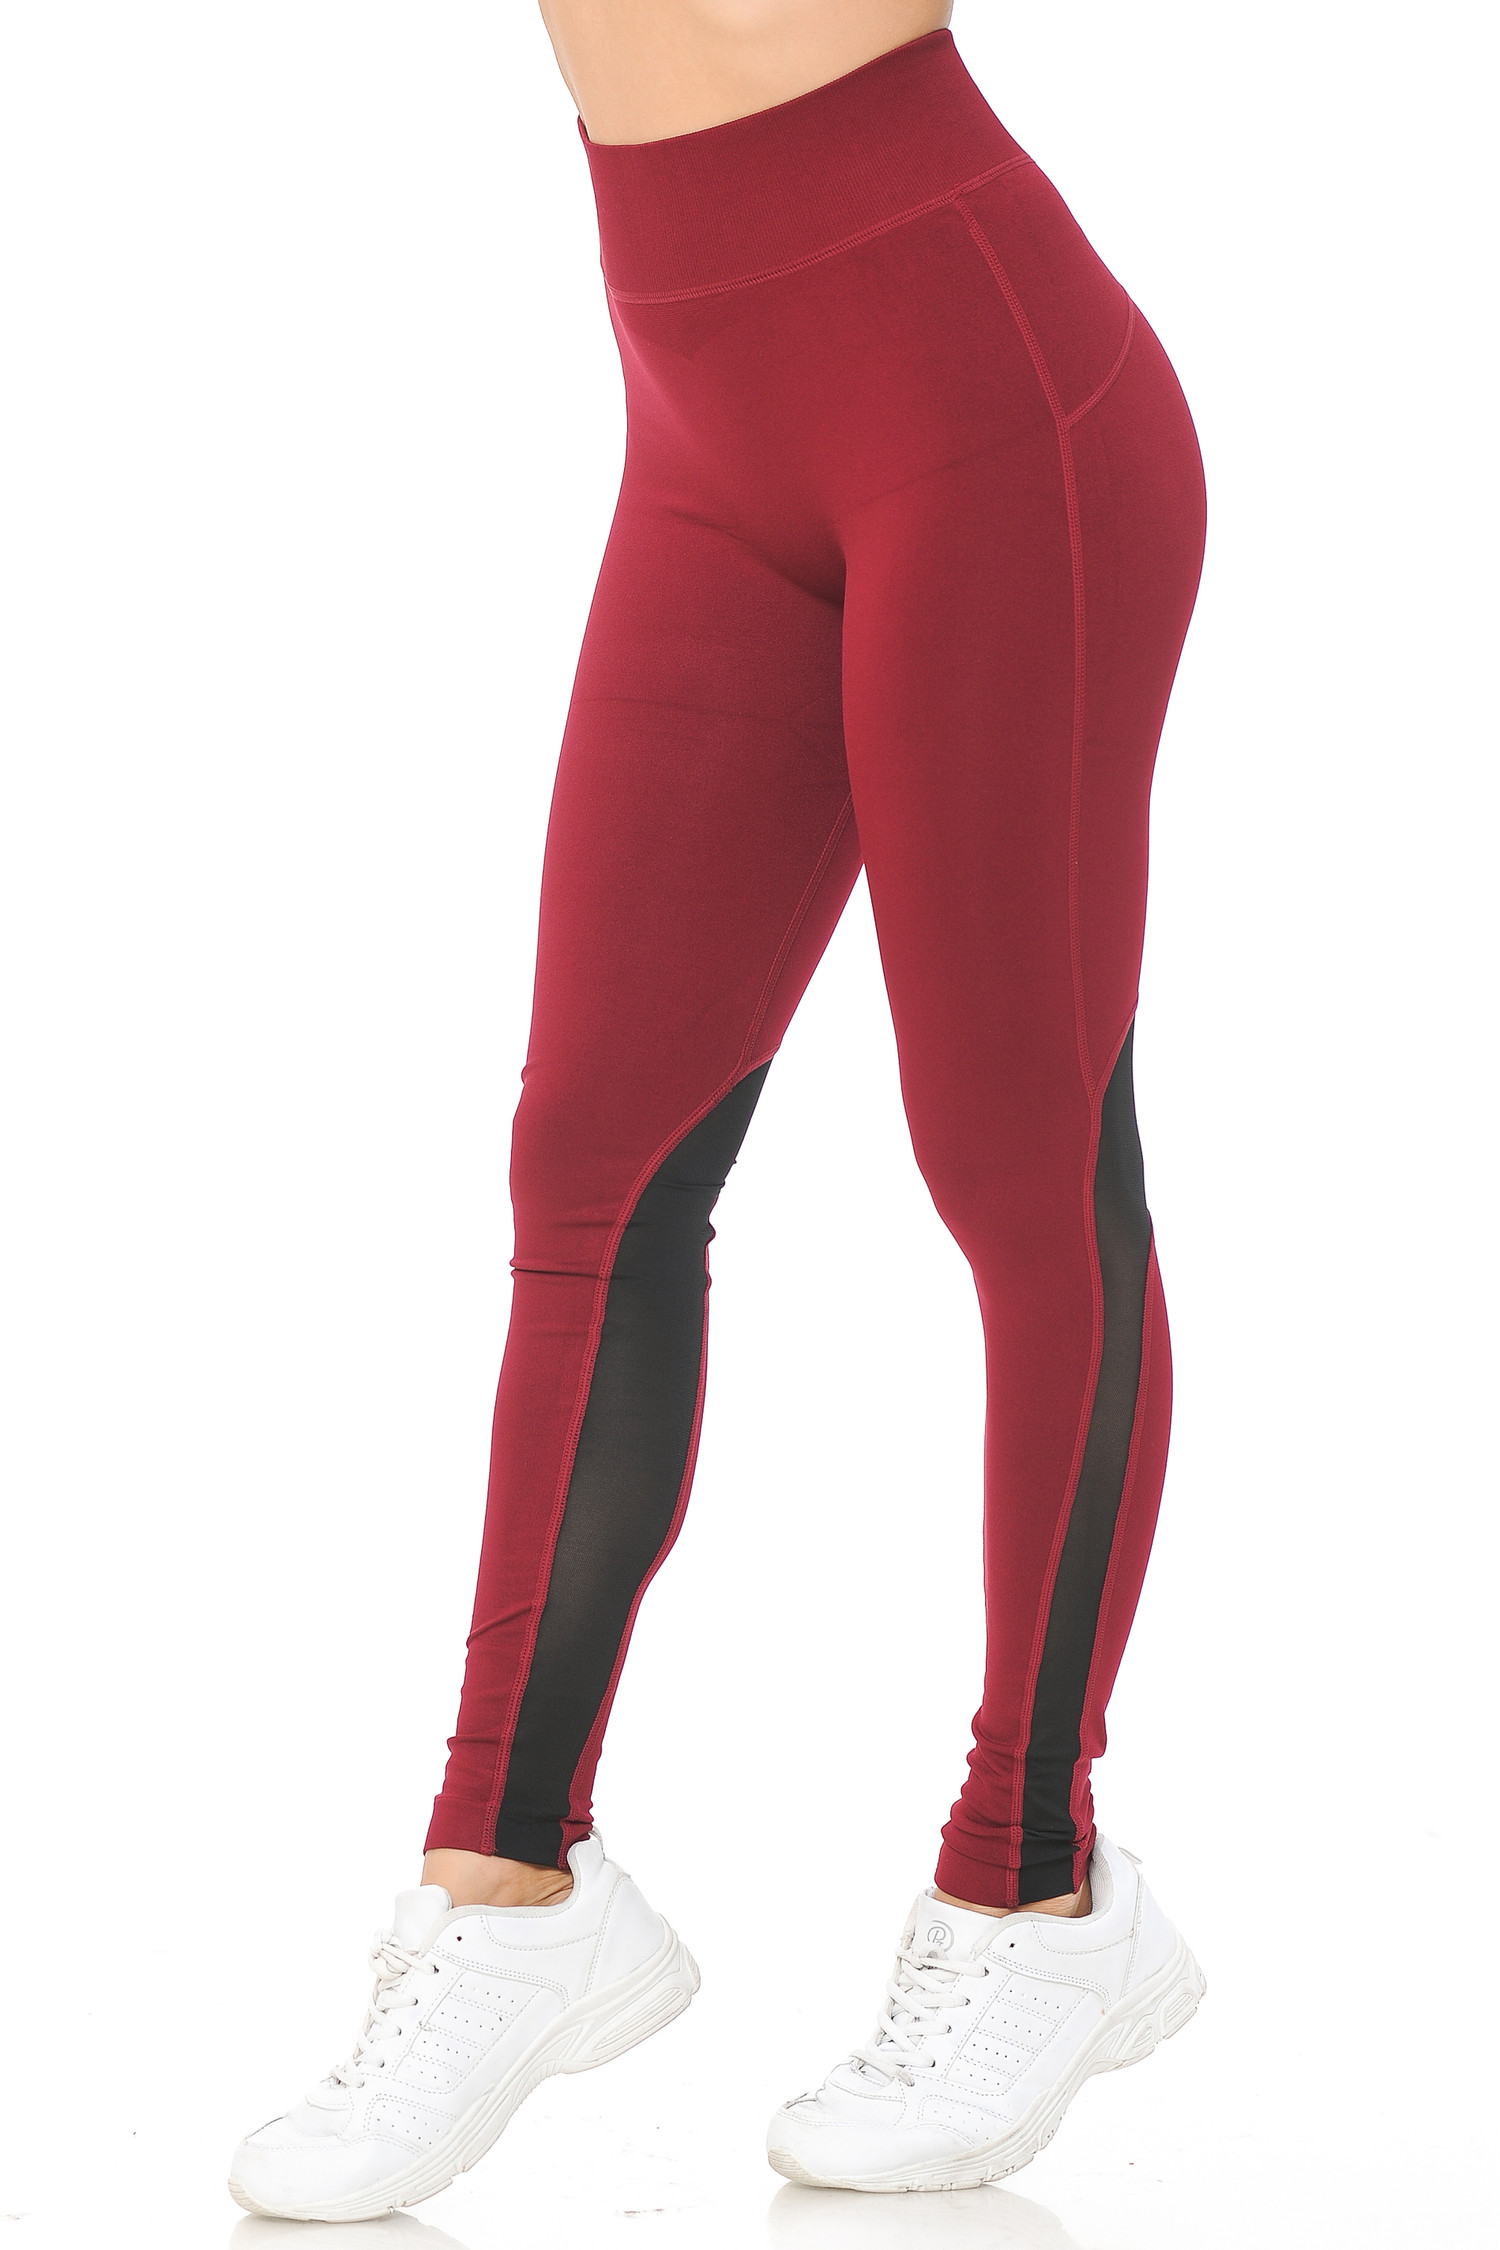 Sport Ankle Mesh Workout Leggings